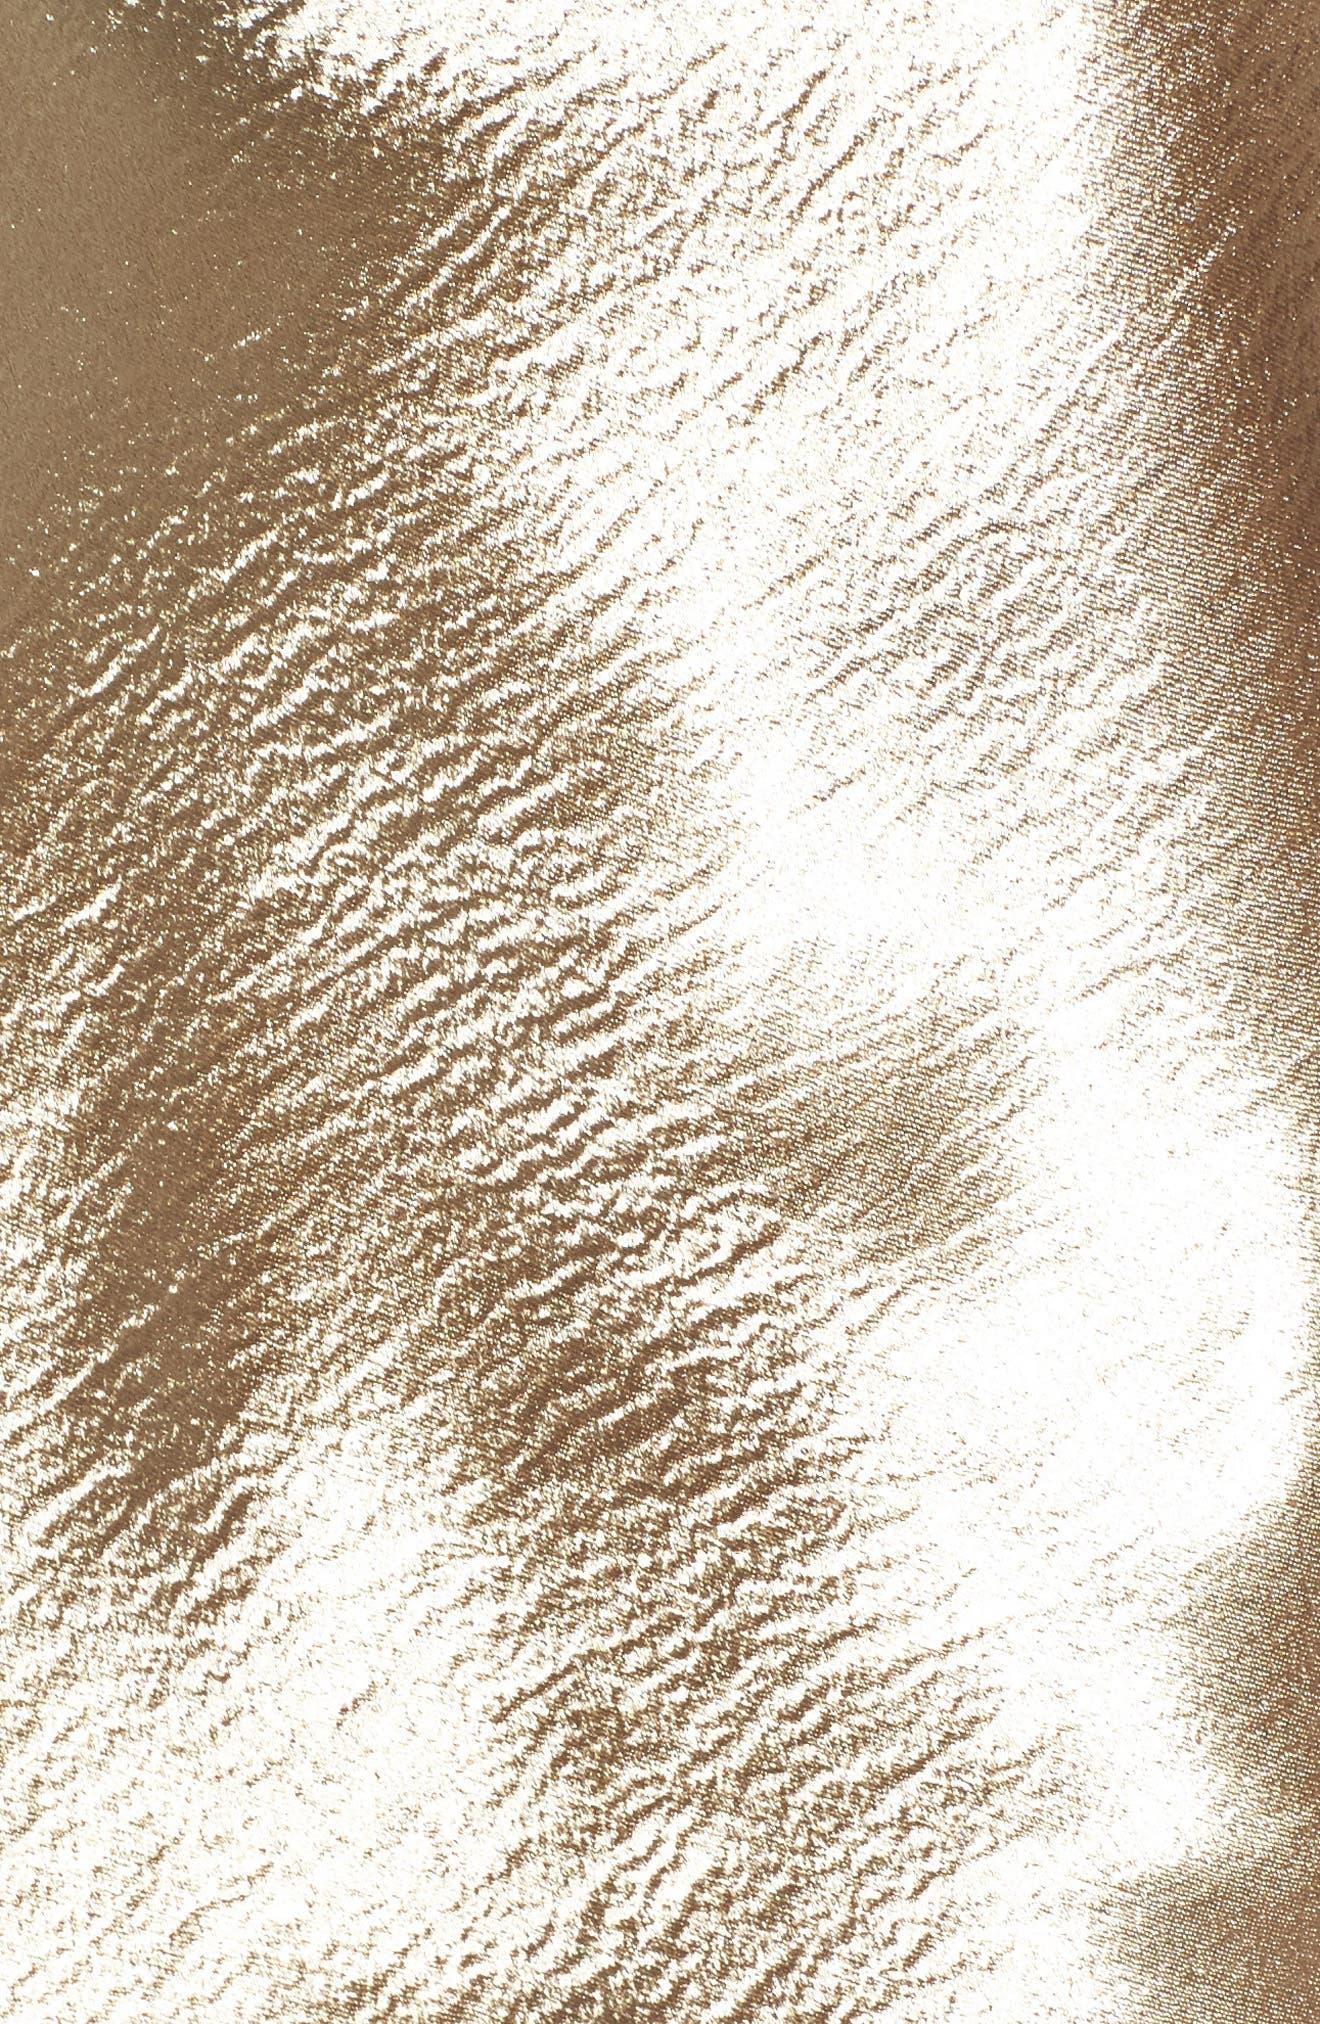 Metallic Cowl Neck Top,                             Alternate thumbnail 5, color,                             710